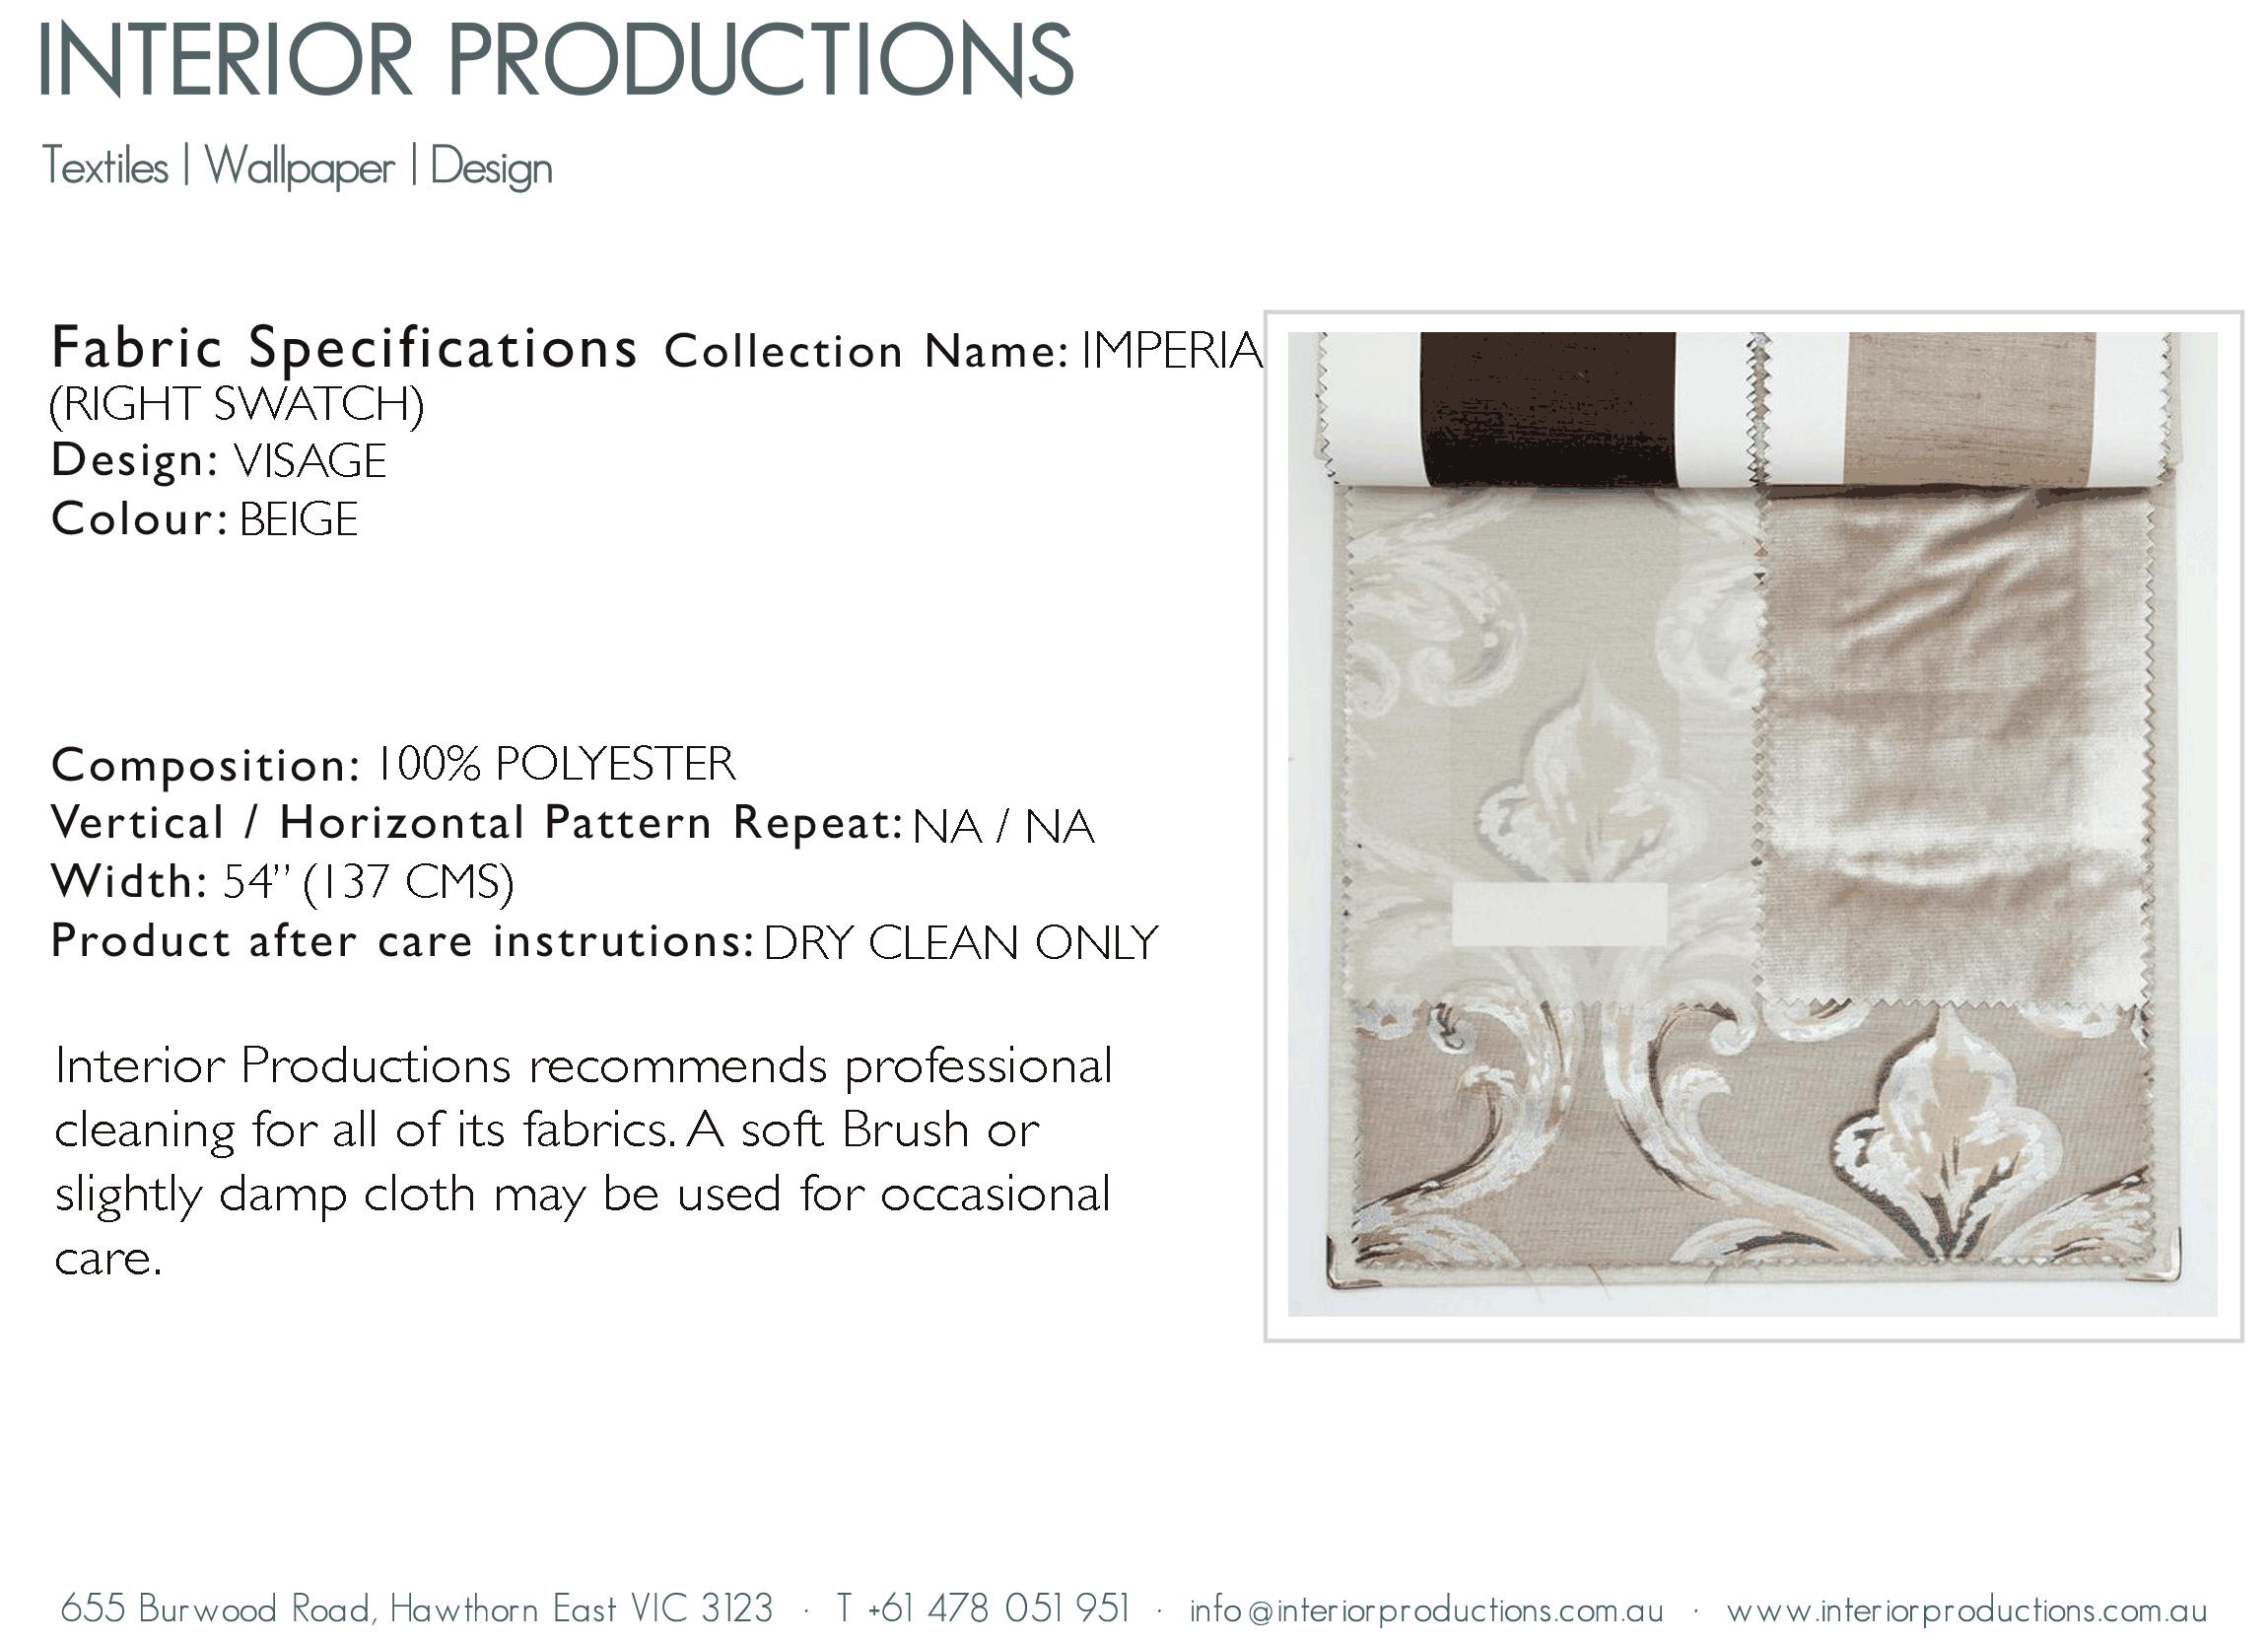 interior_productions_VISAGE---BEIGE